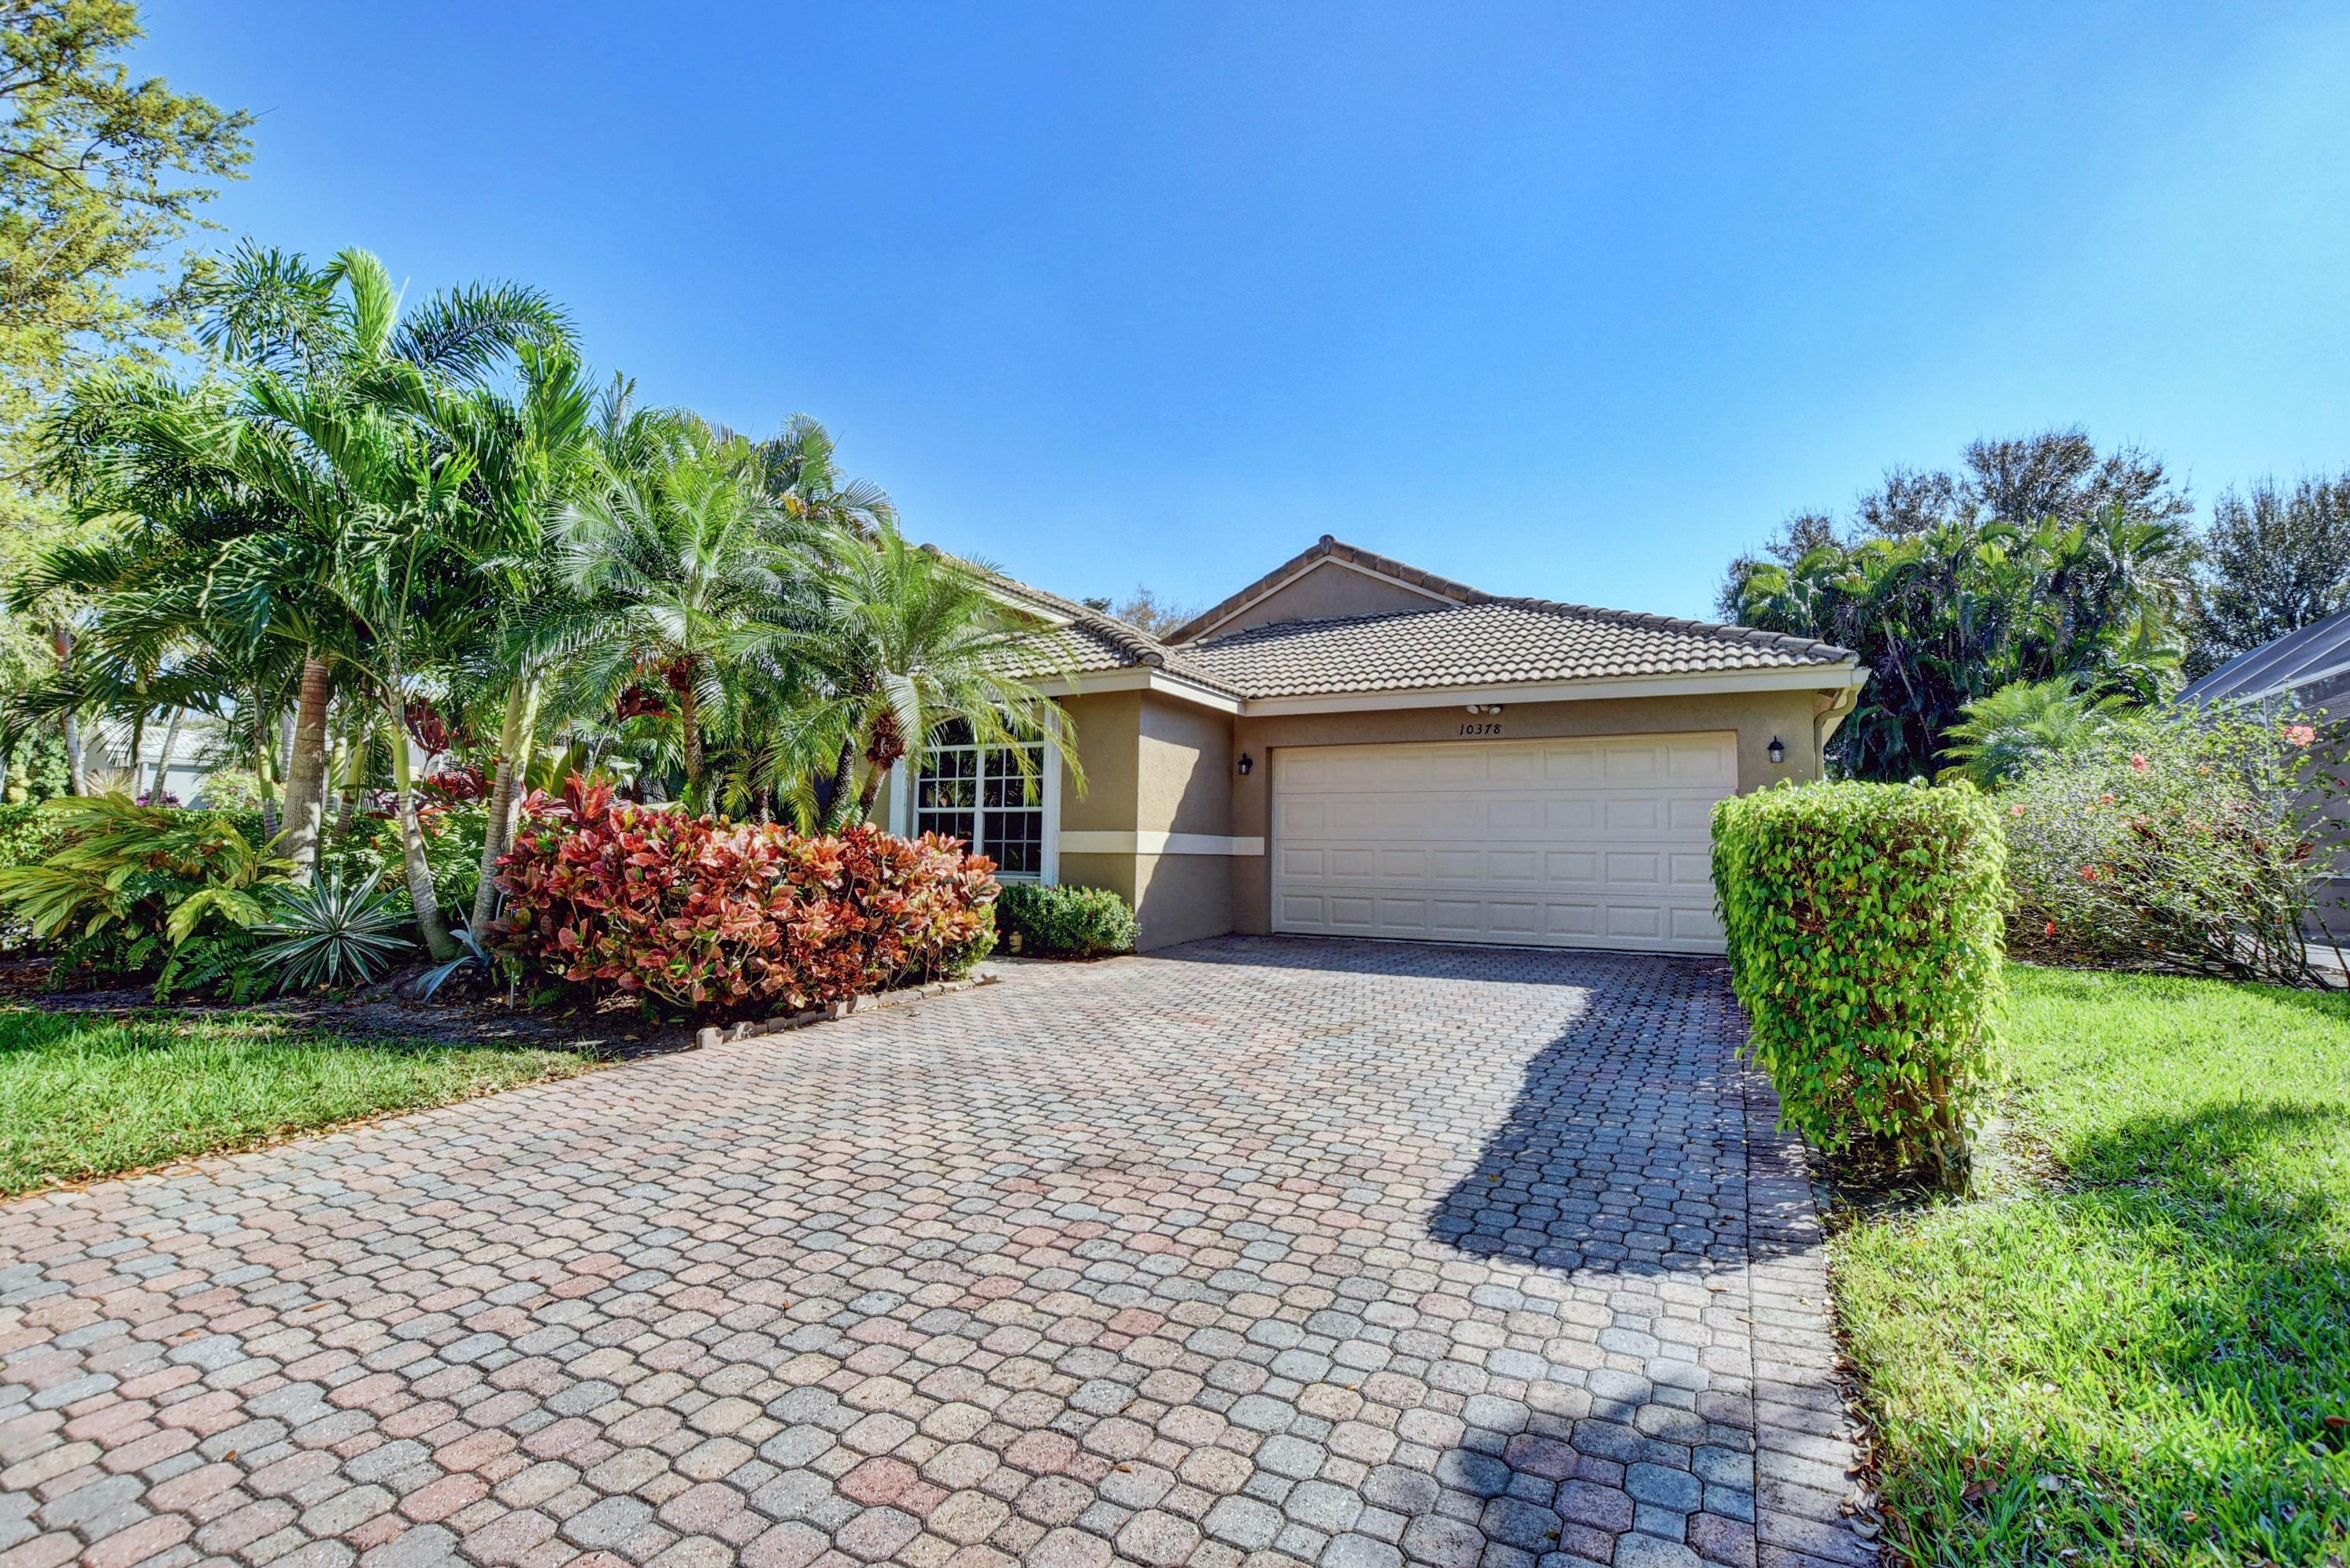 Home for sale in The Club Boynton Beach Florida